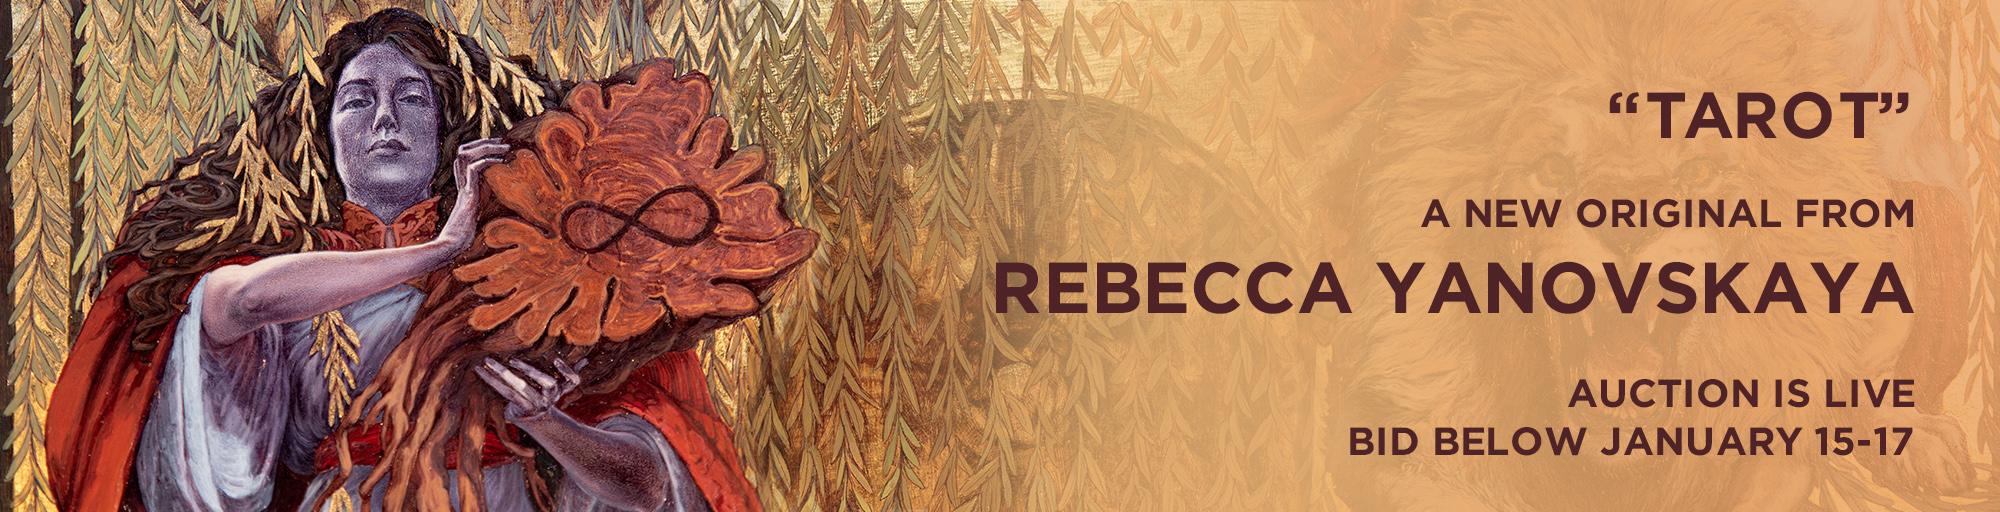 Tarot, an mixed media original by Rebecca Yanovskaya